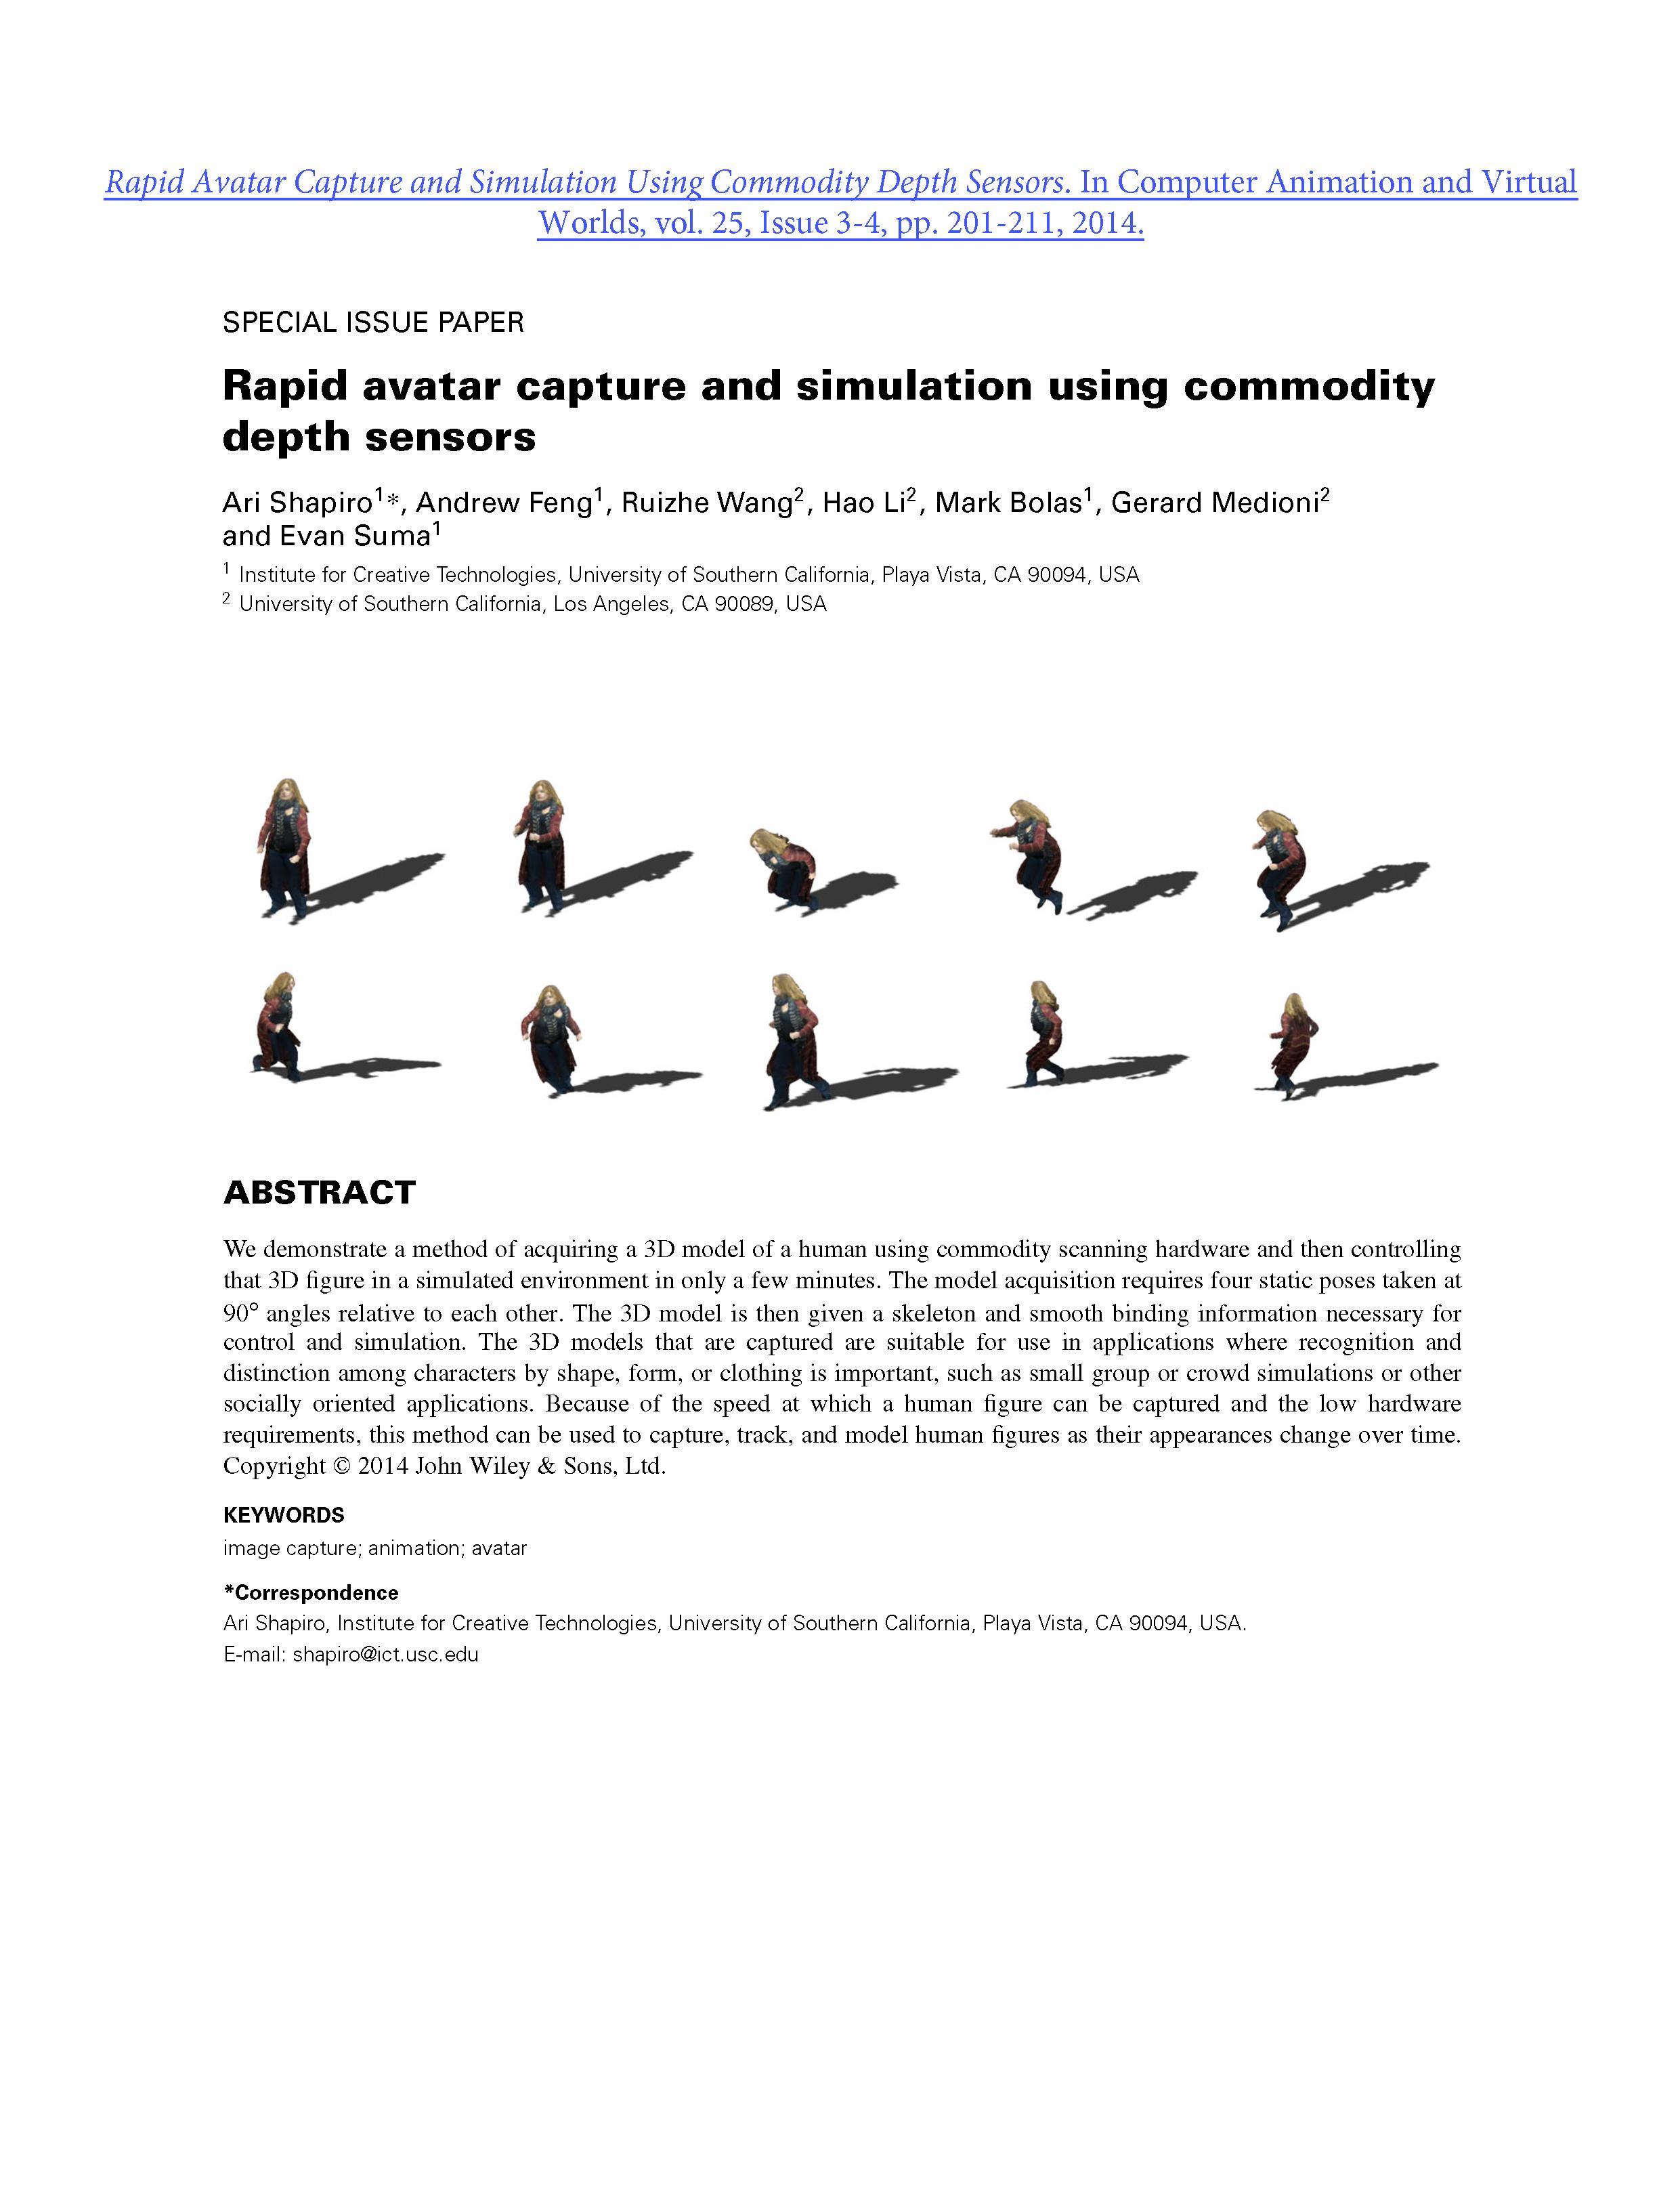 2014.05- Rapid Avatar Capture and Simulation Using Commodity Depth Sensors_TOP SHEET_JP.png